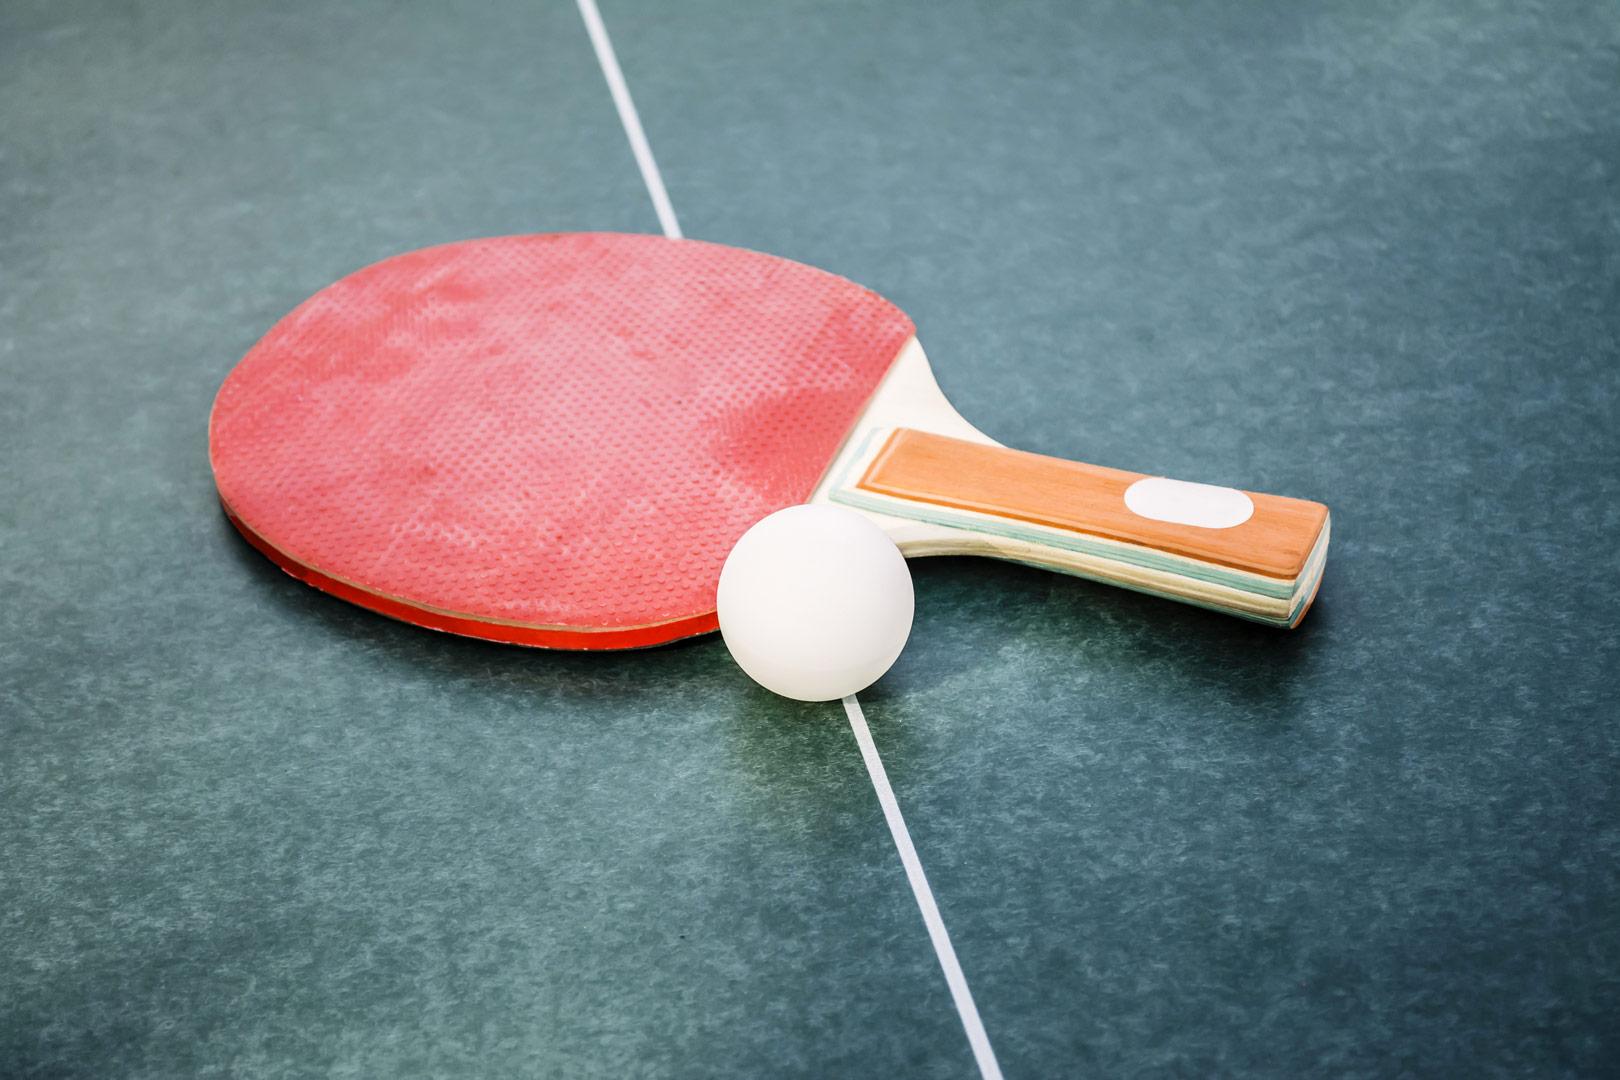 Tennis de table neuilly sur marne - Choisir raquette tennis de table ...